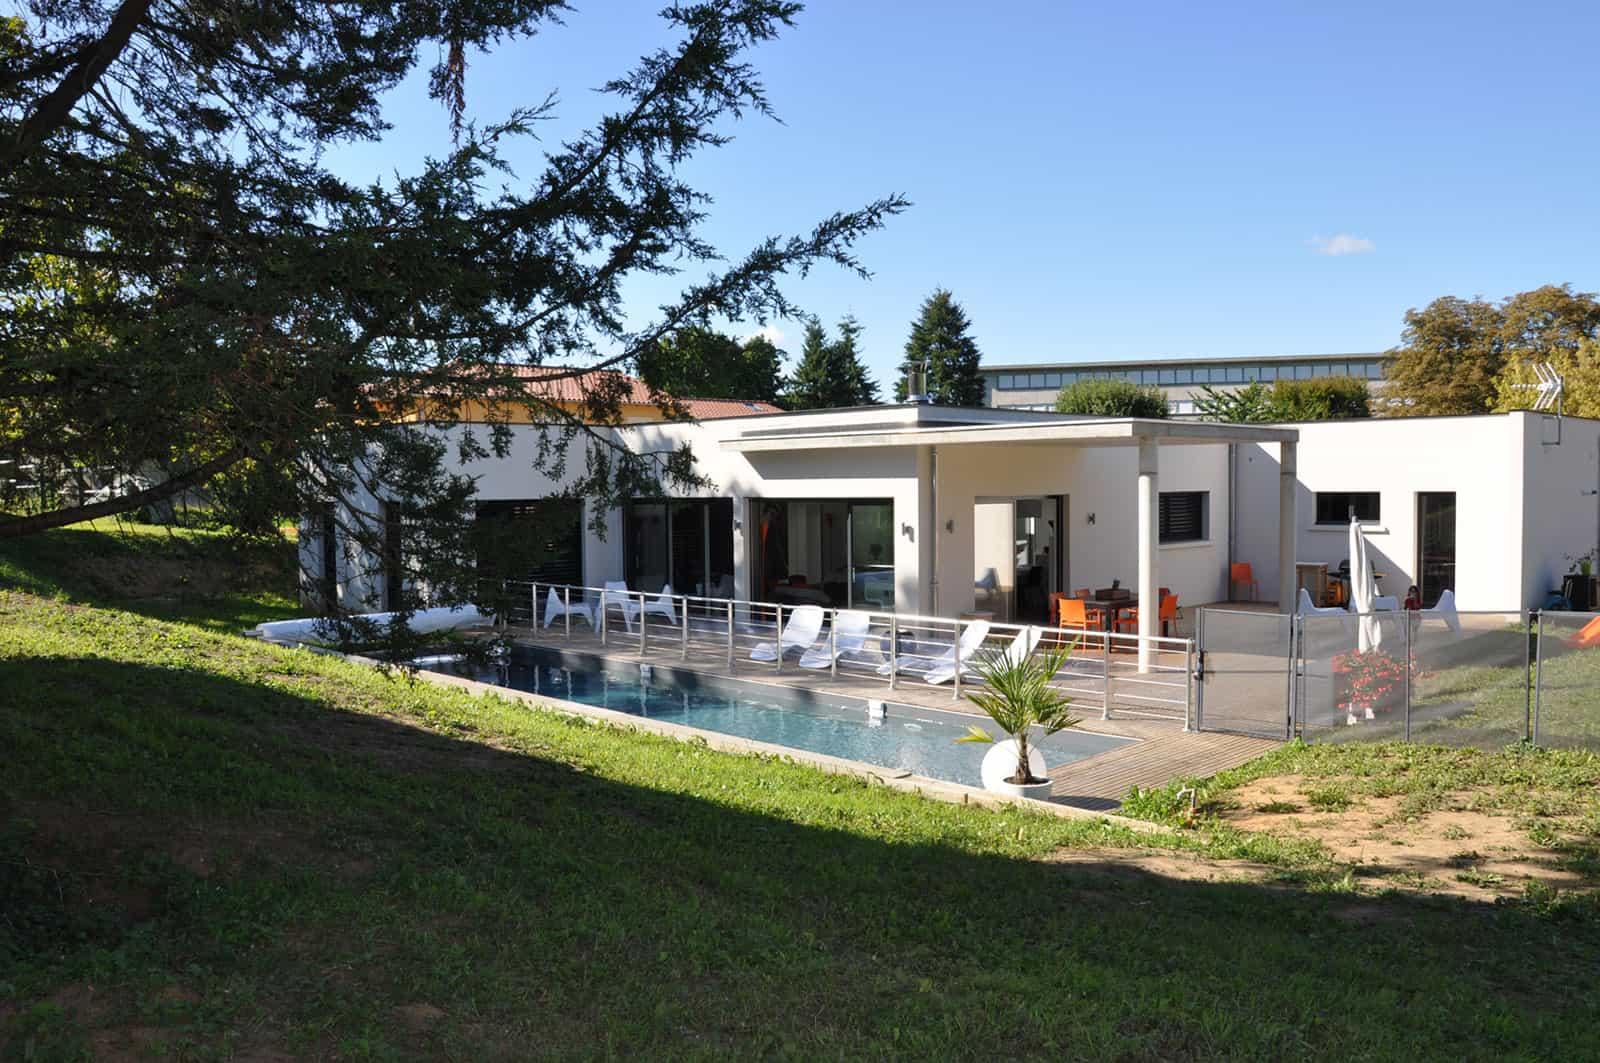 The Apple House by Val de Saône Bâtiment